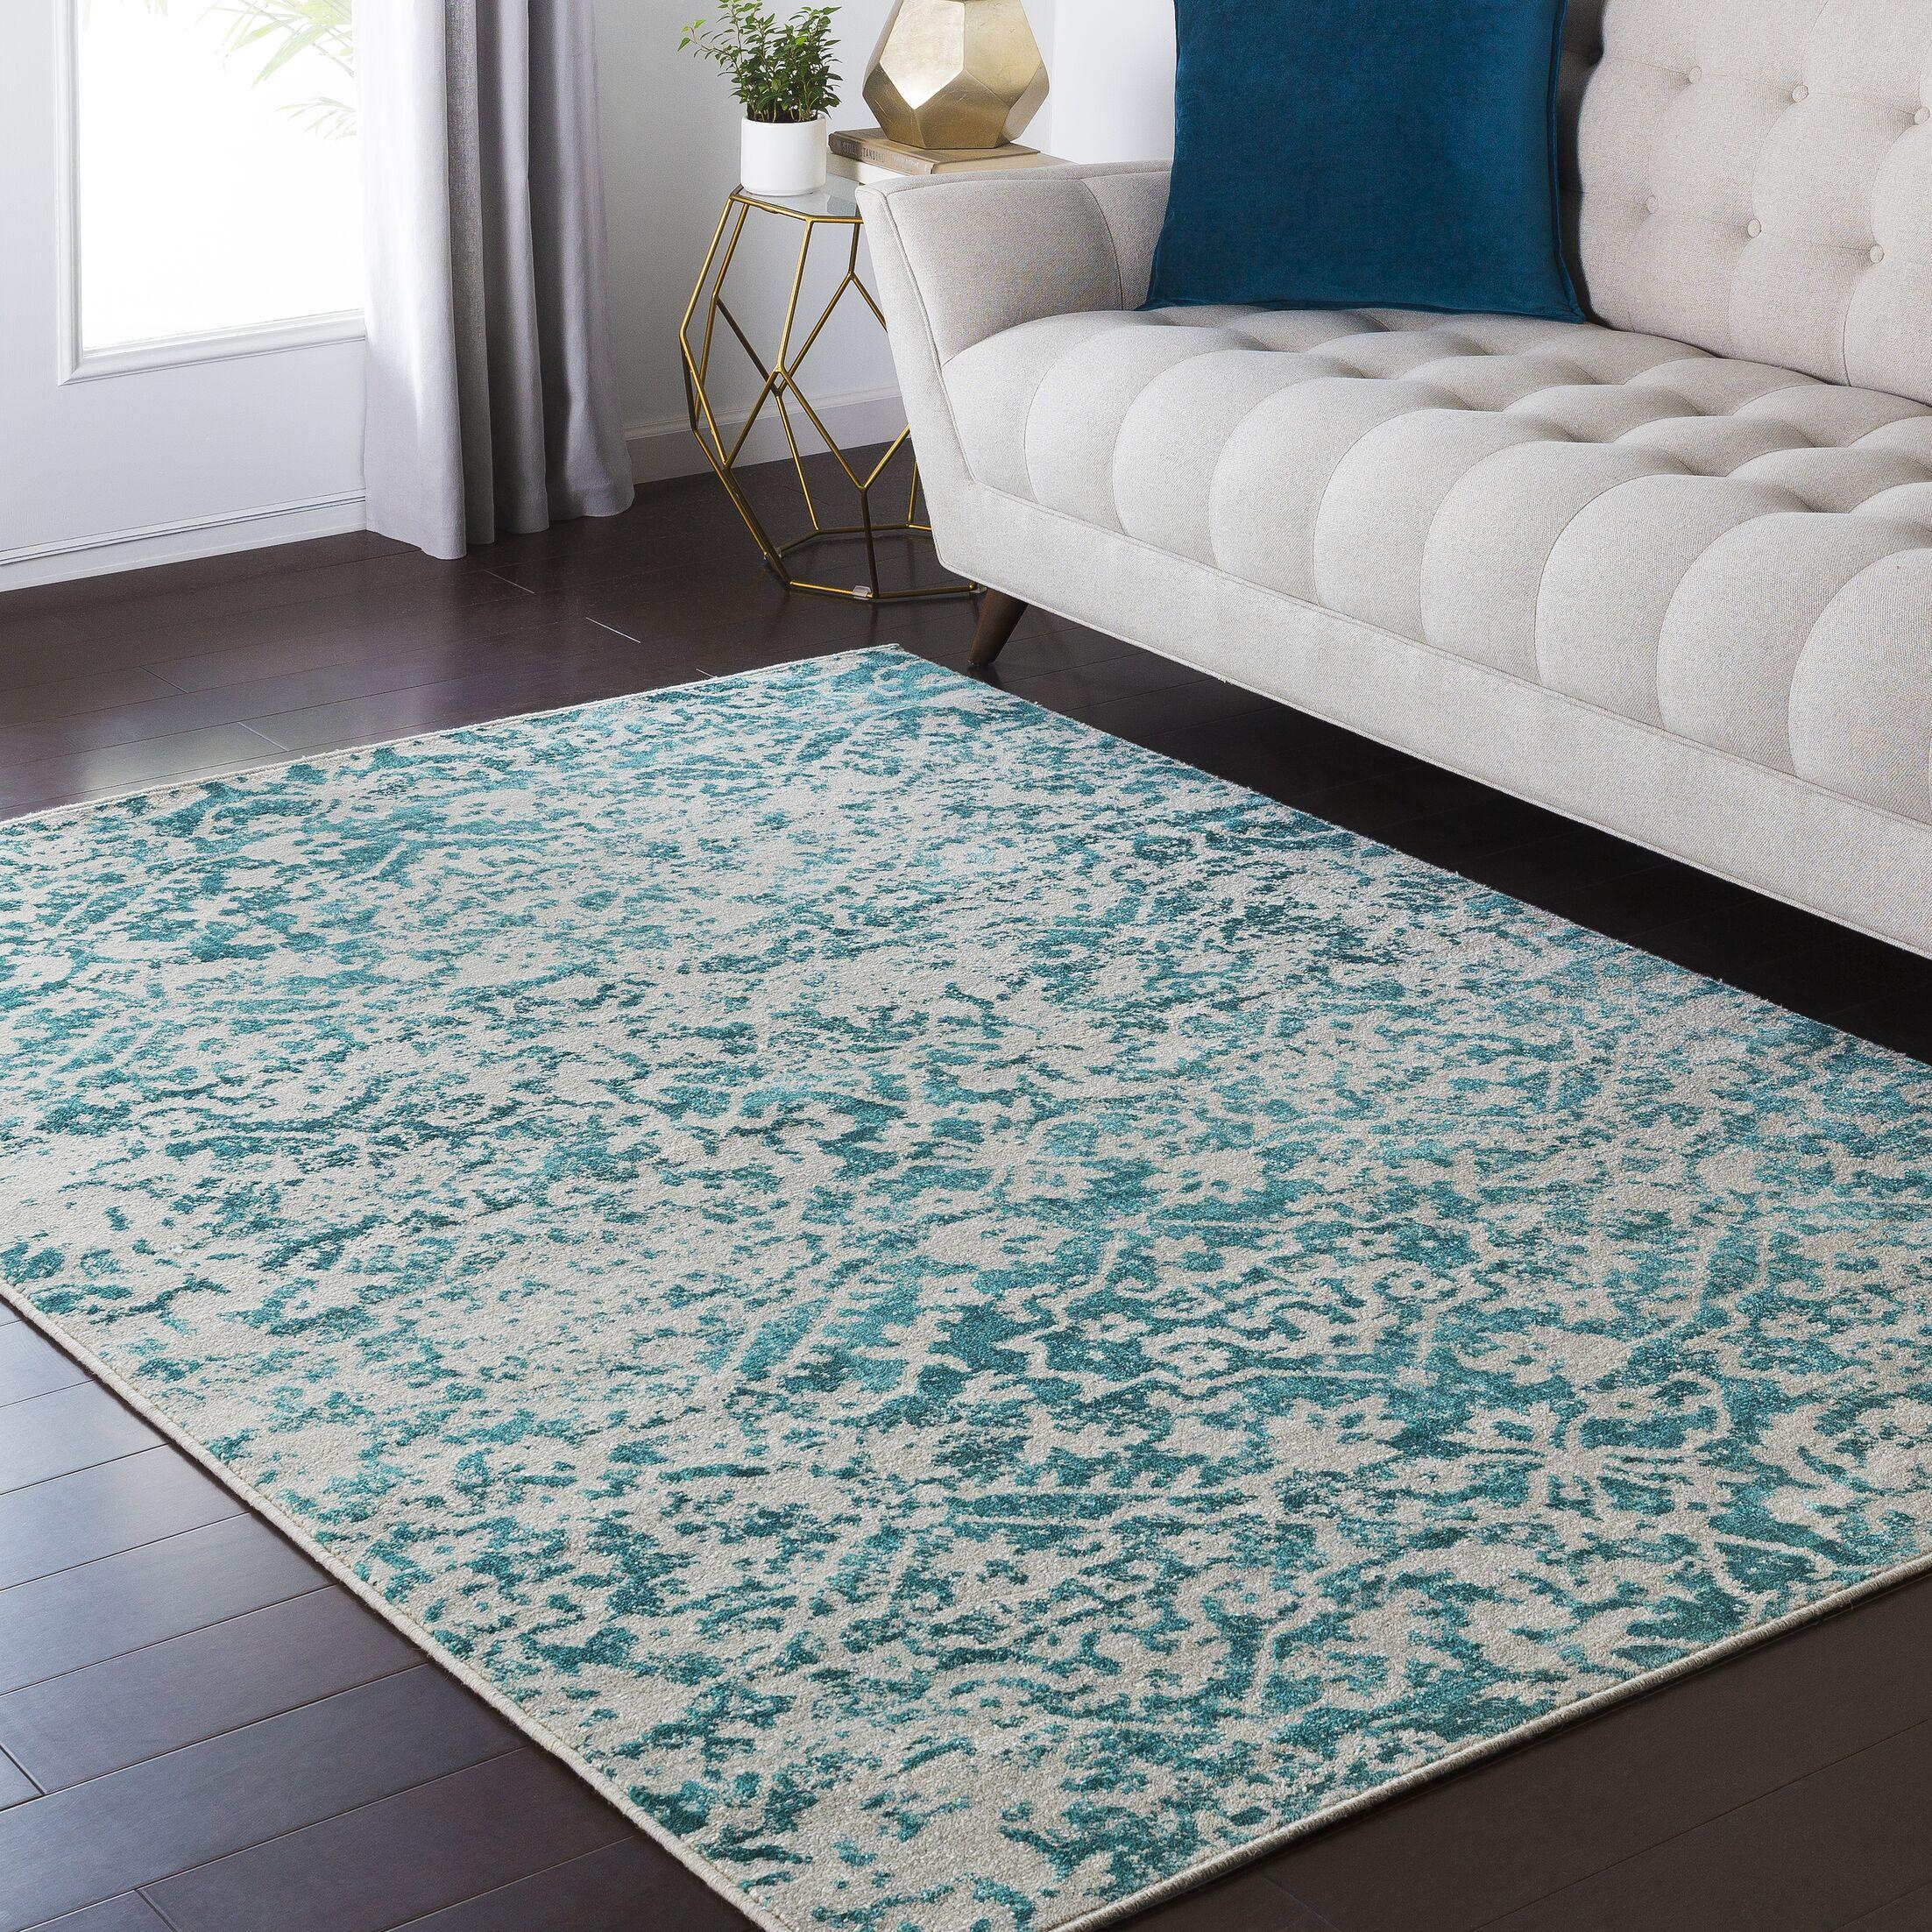 Puran Gray/Blue Area Rug Rug Size: 8'10